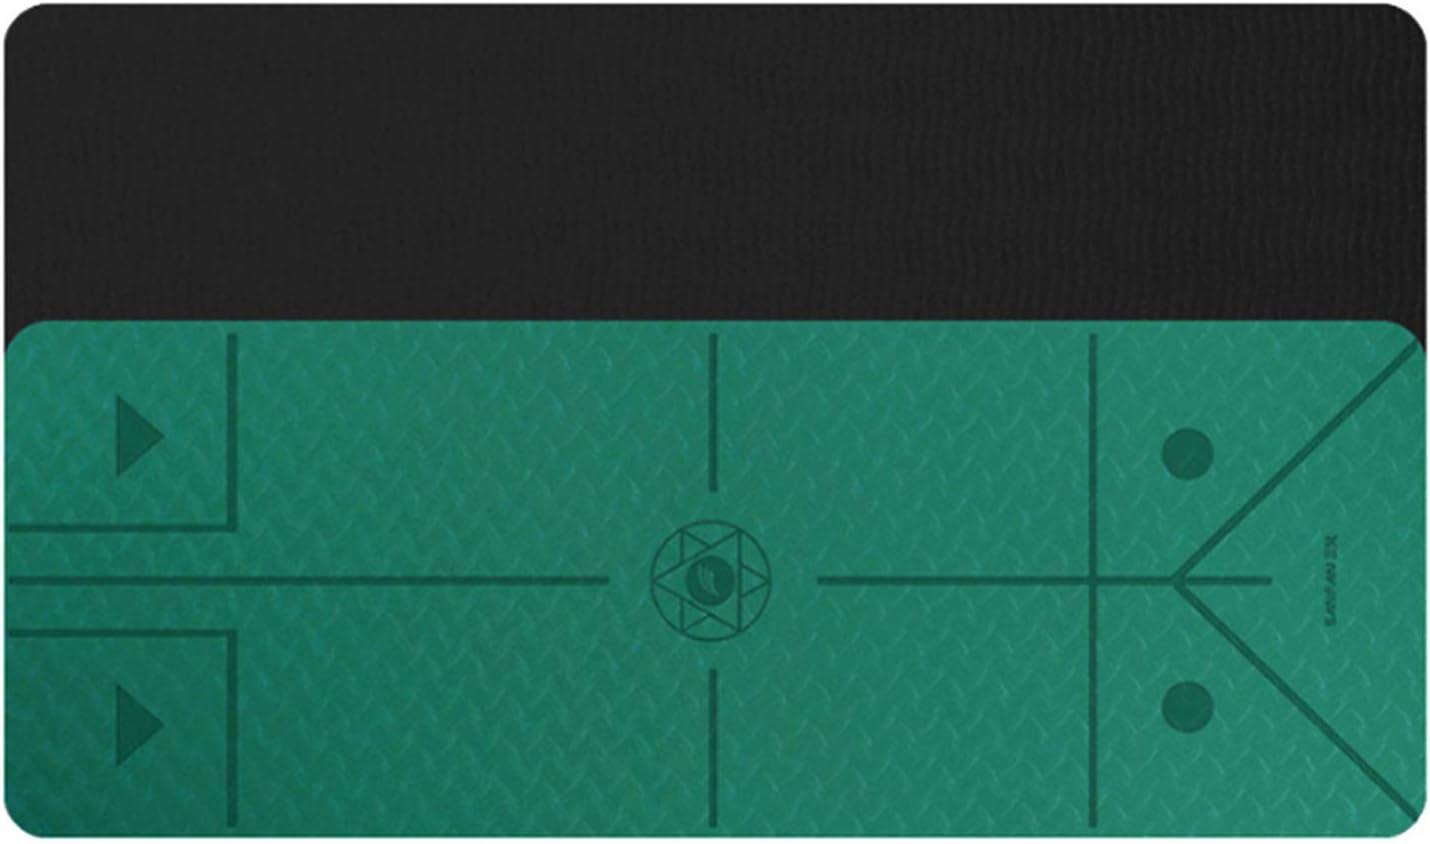 100% quality warranty FitTrek Yoga Mat Fitness Specifications 72